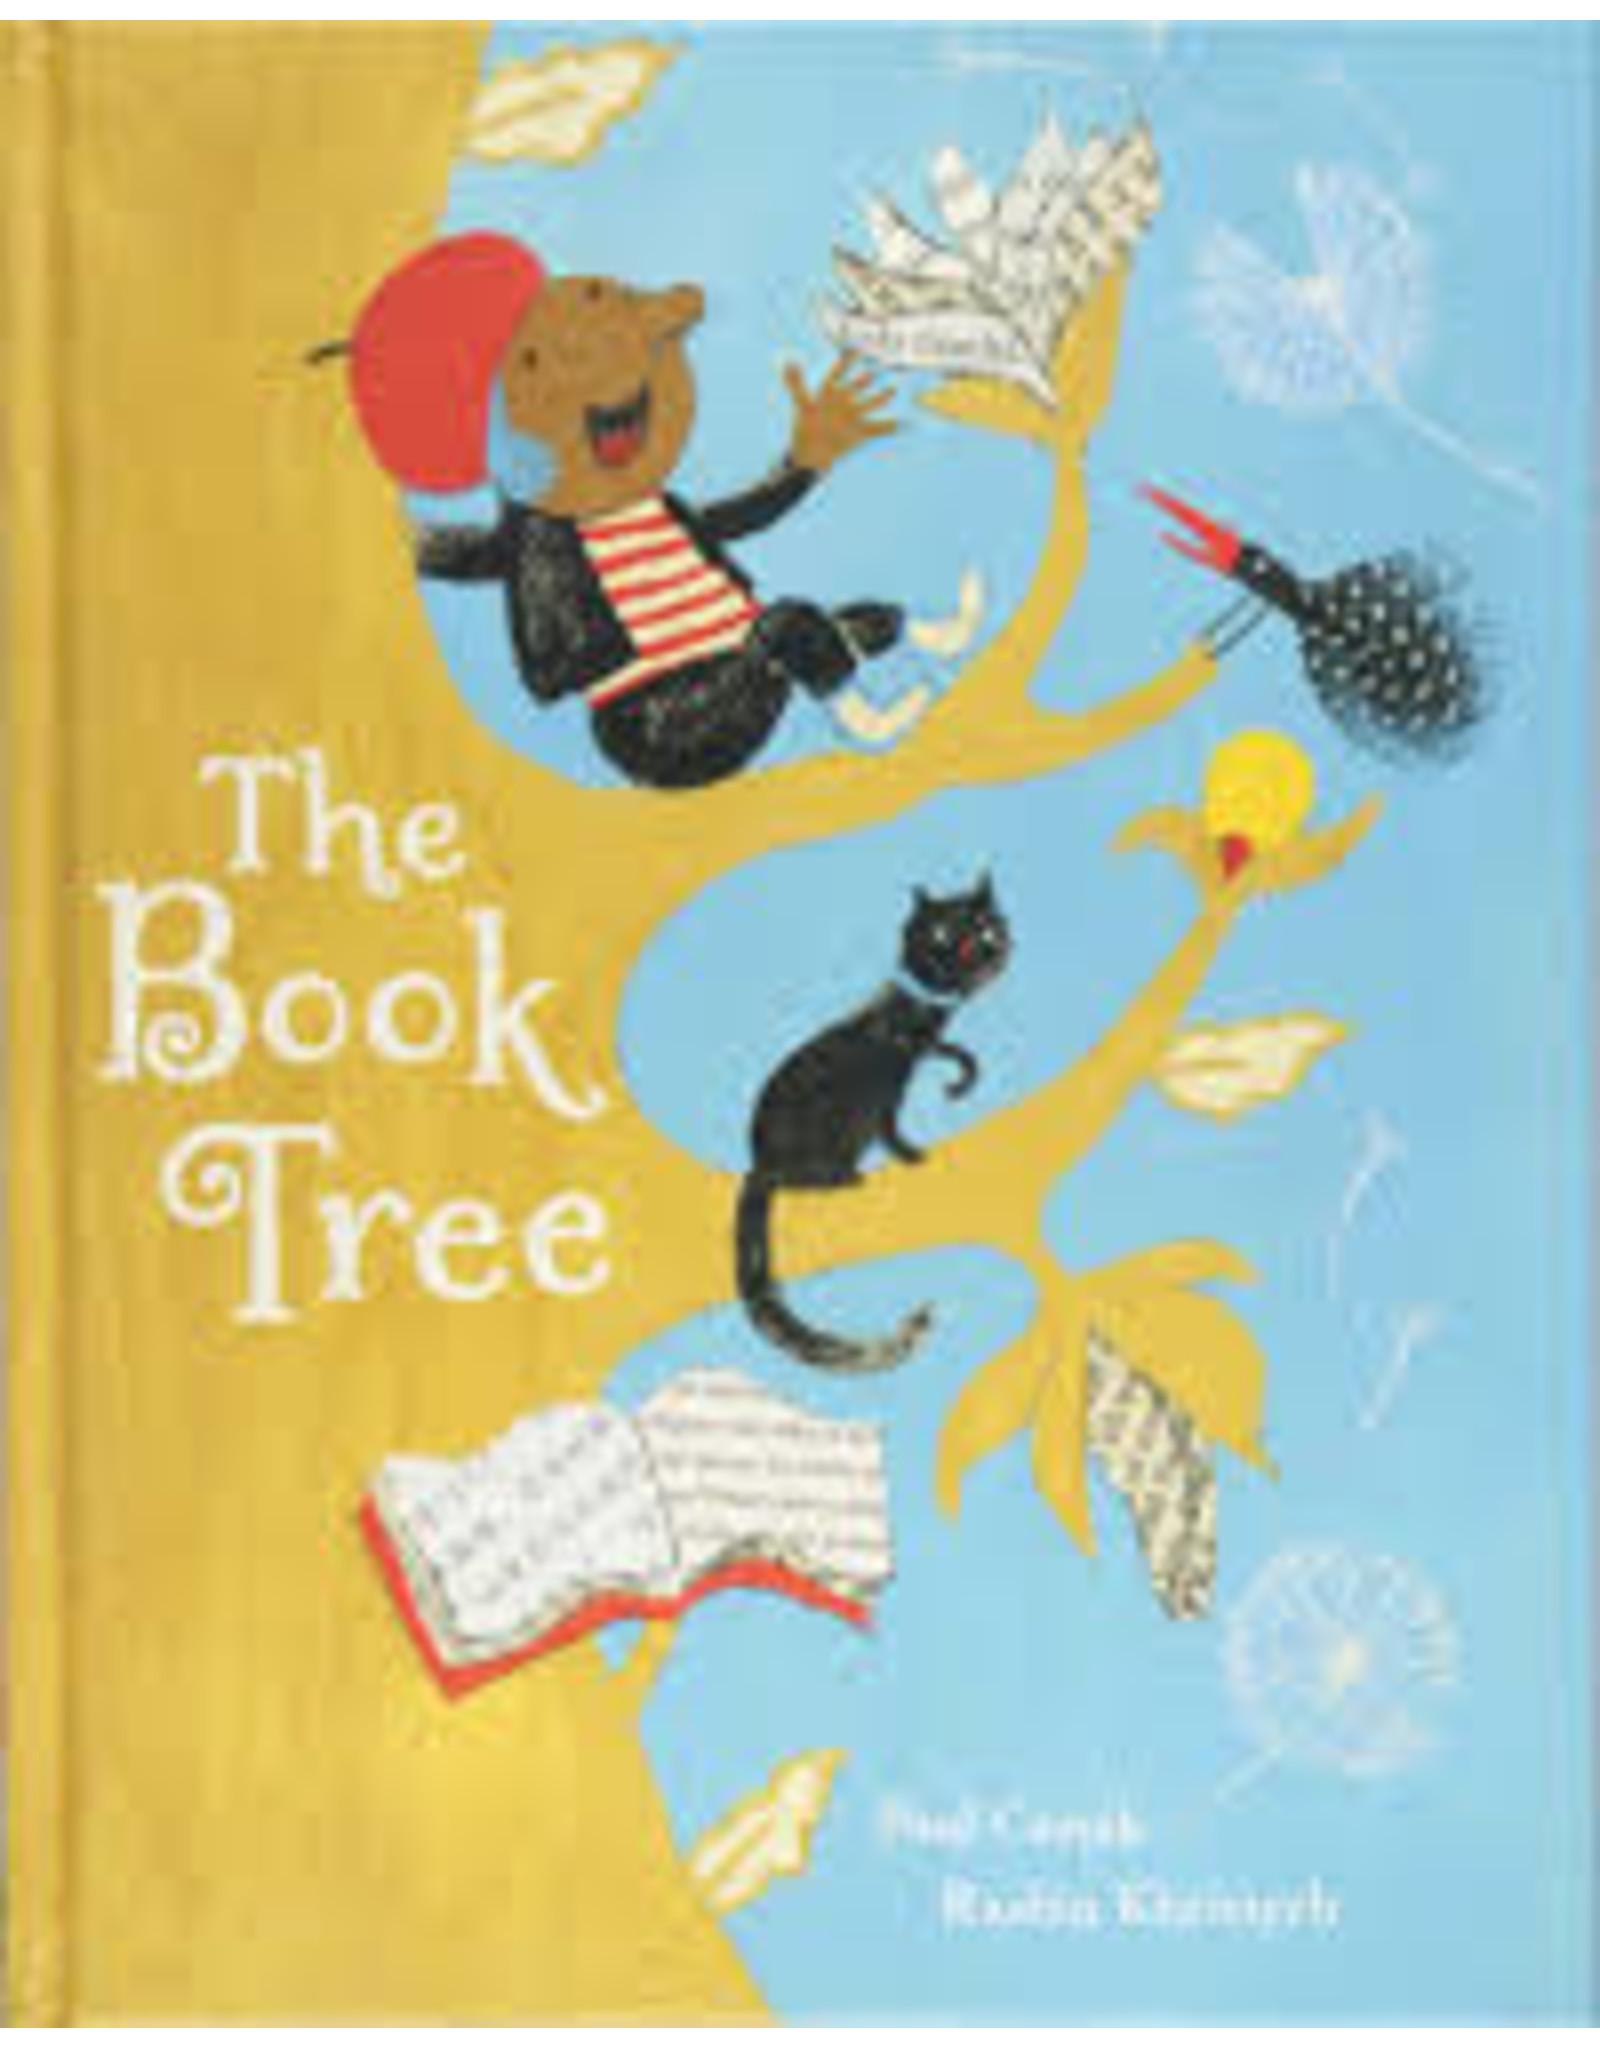 Books The book Tree by Paul Czajak (IndieBookstoreDay)